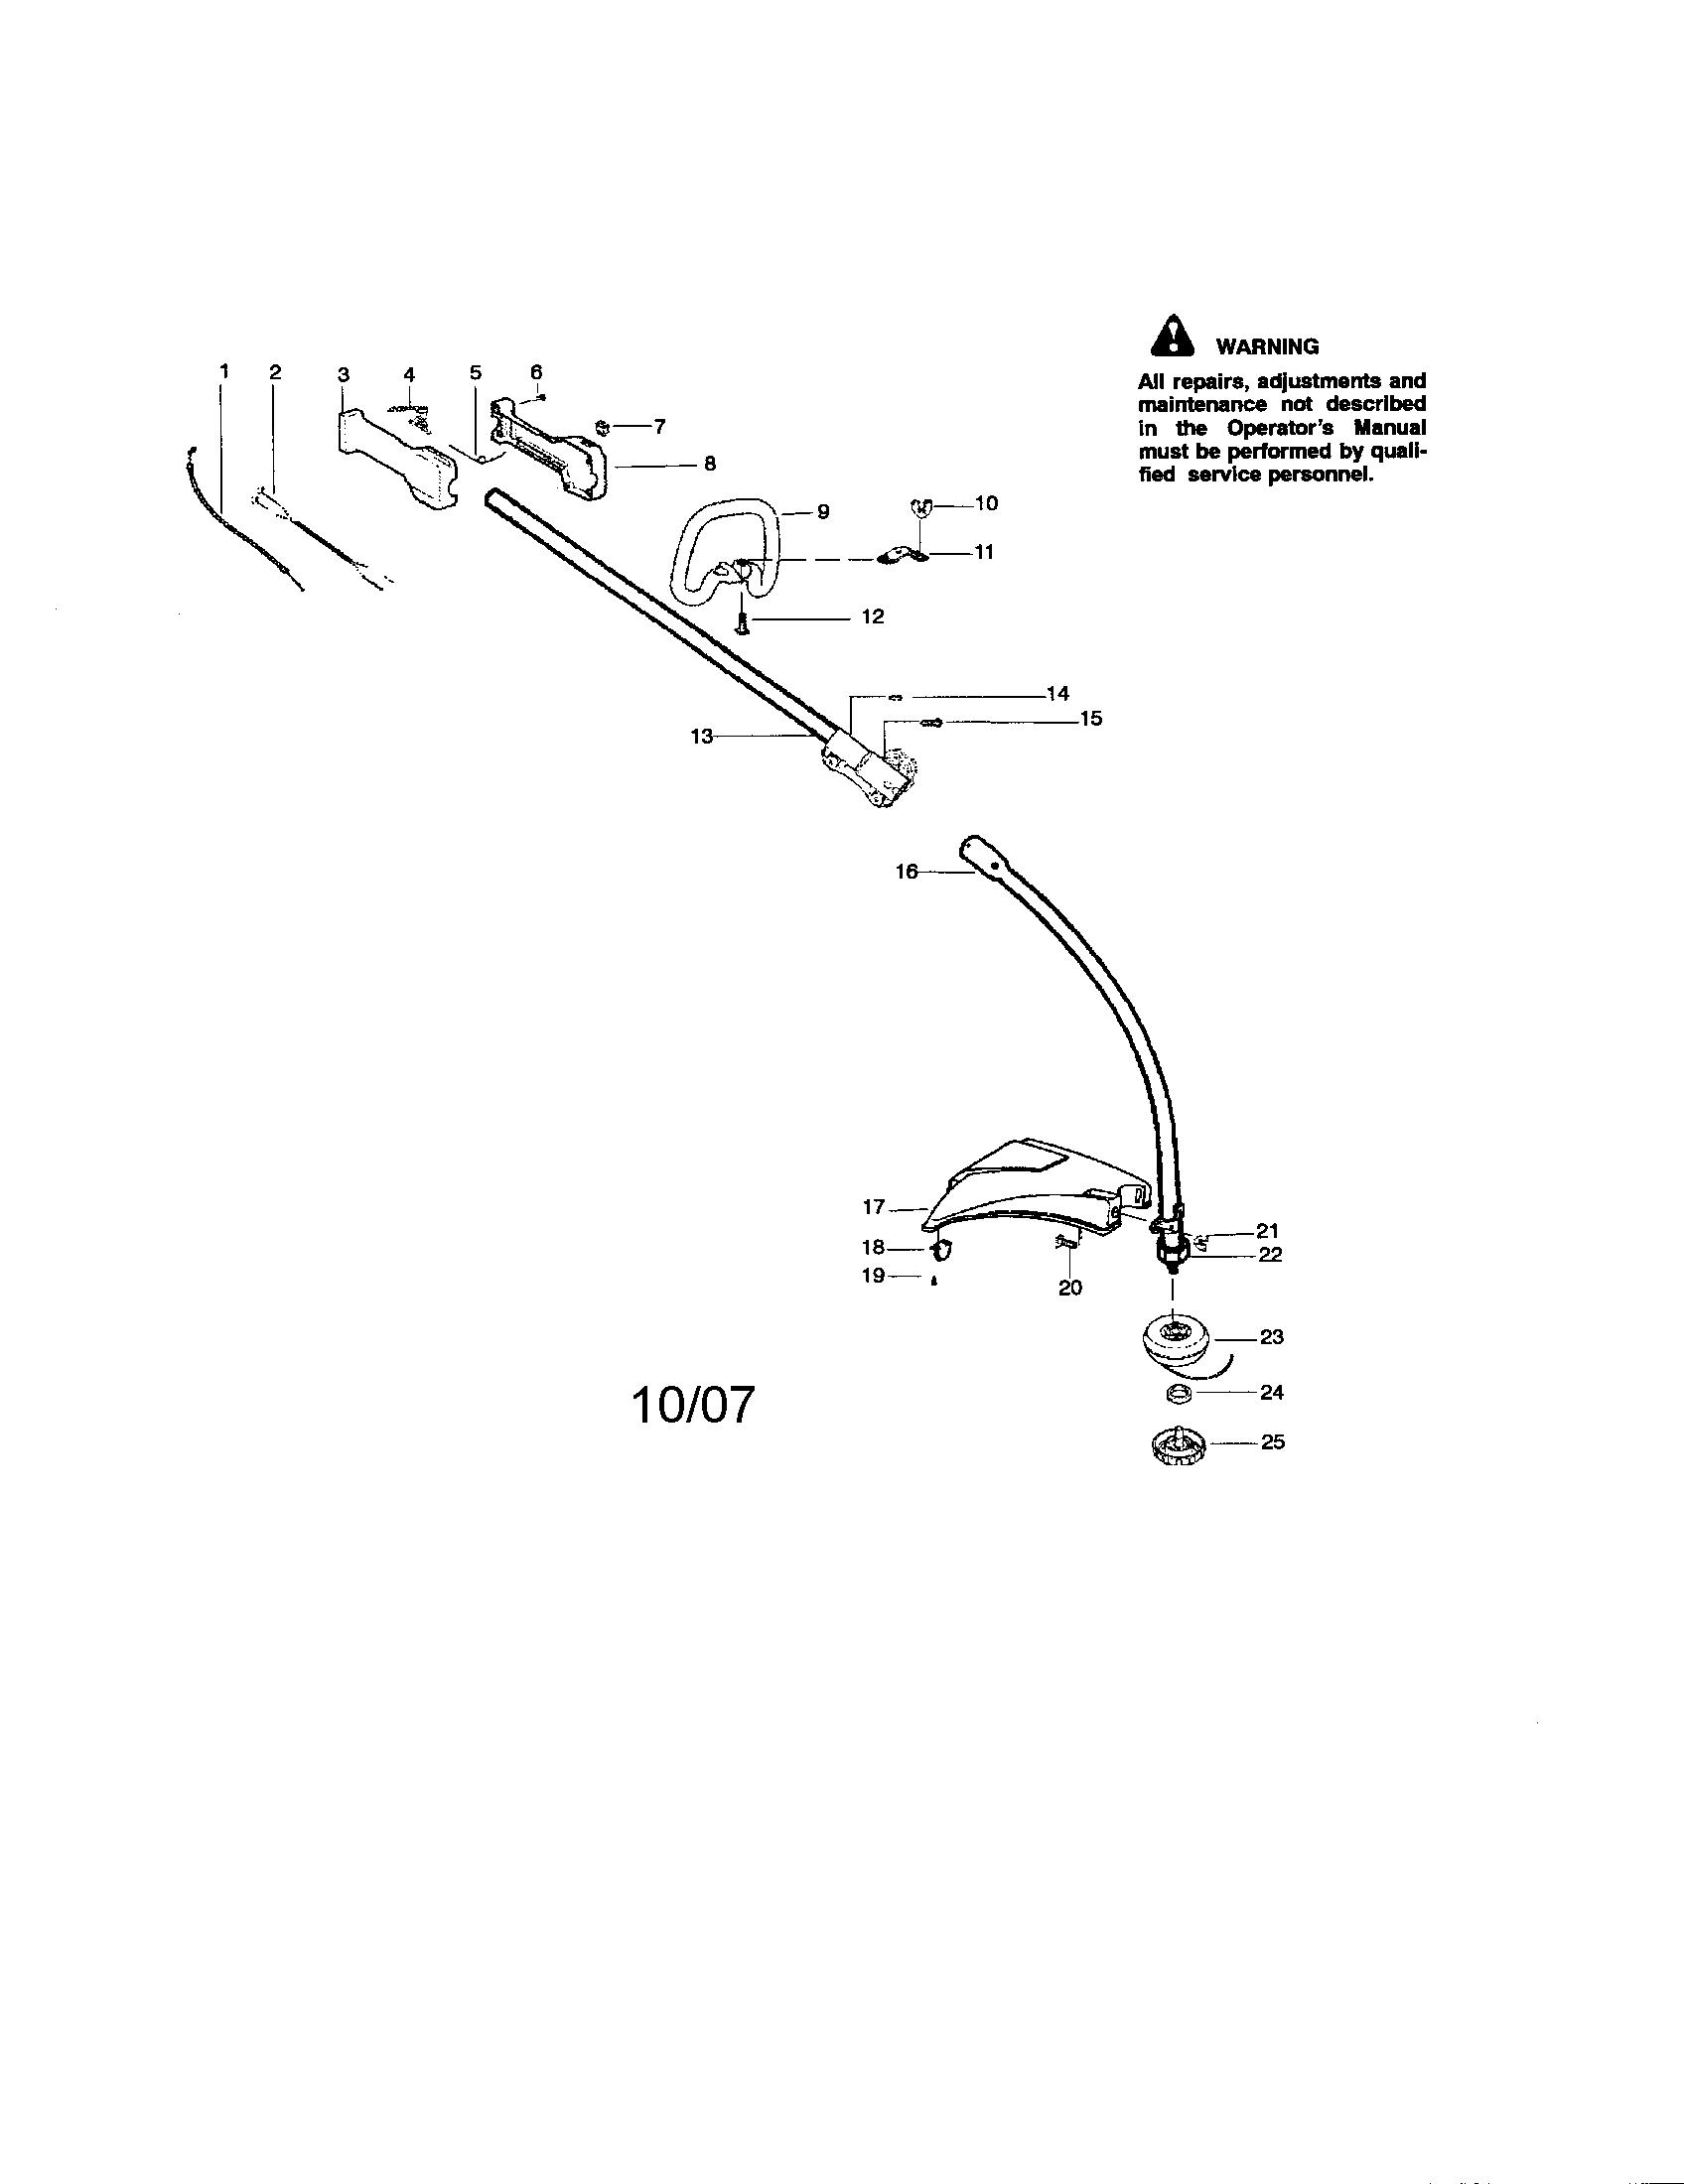 handle diagram and parts list for craftsman walkbehindlawnmower